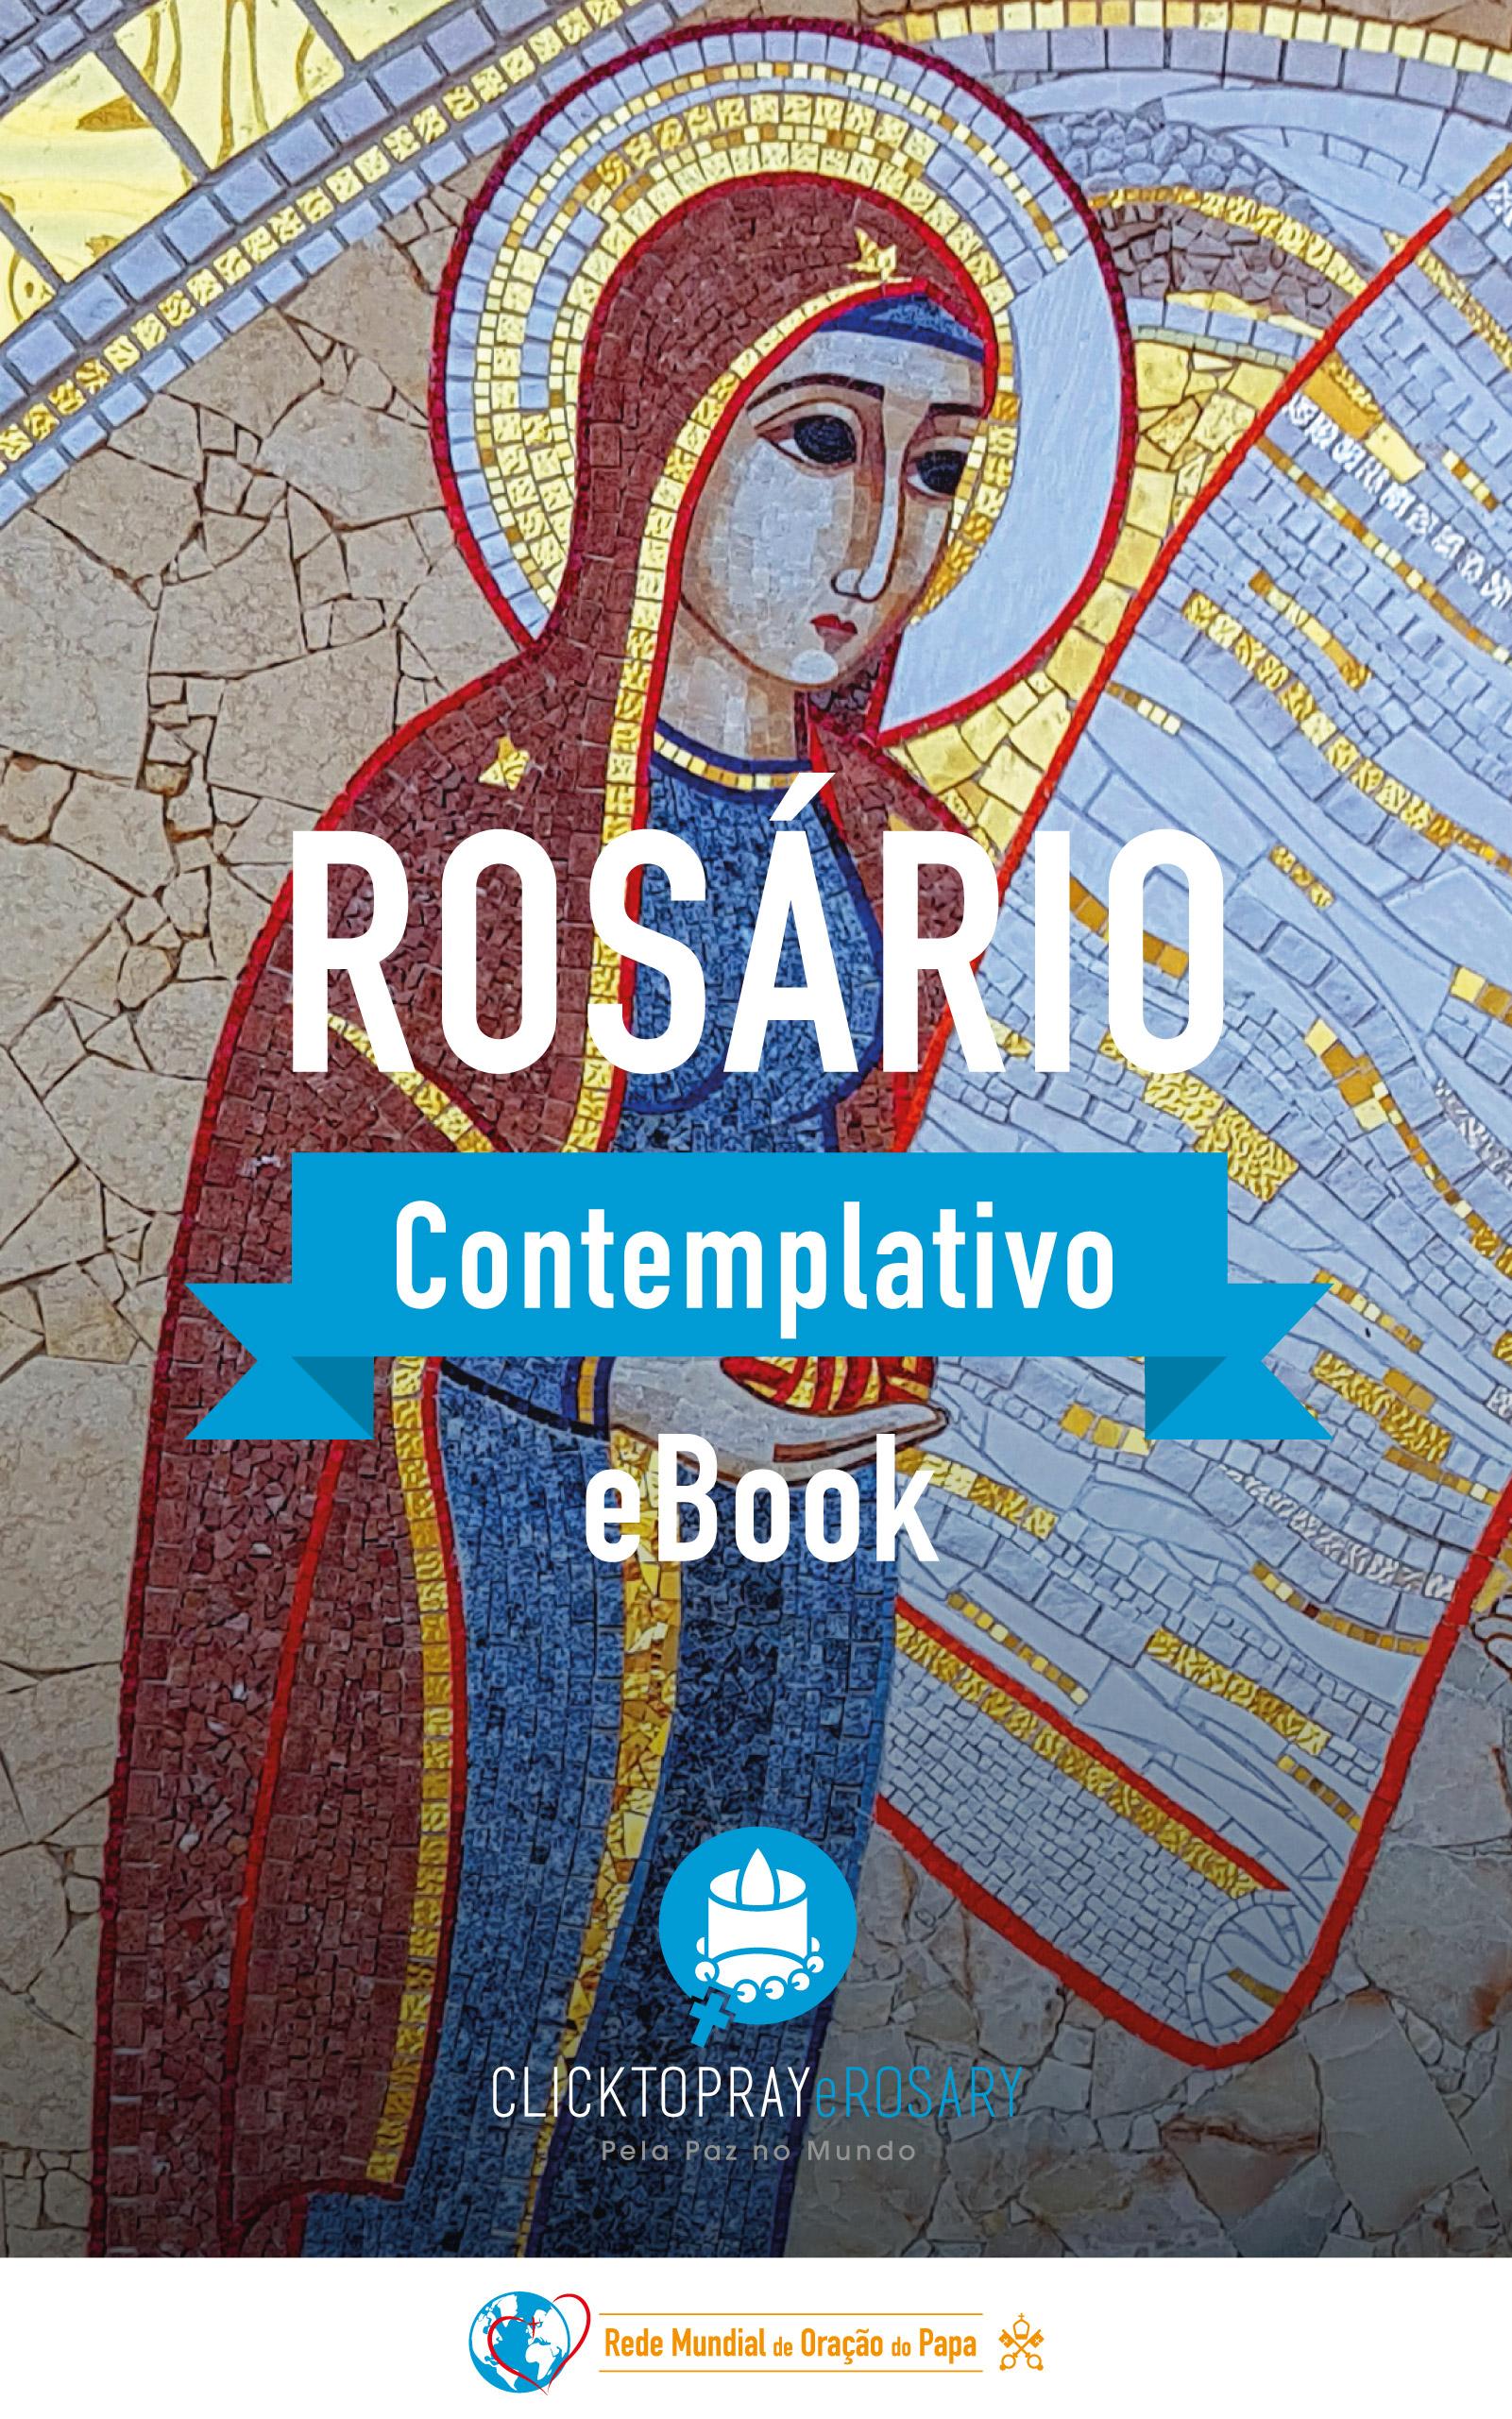 Cover CTPer eBook - Rosario Contemplativo - PT